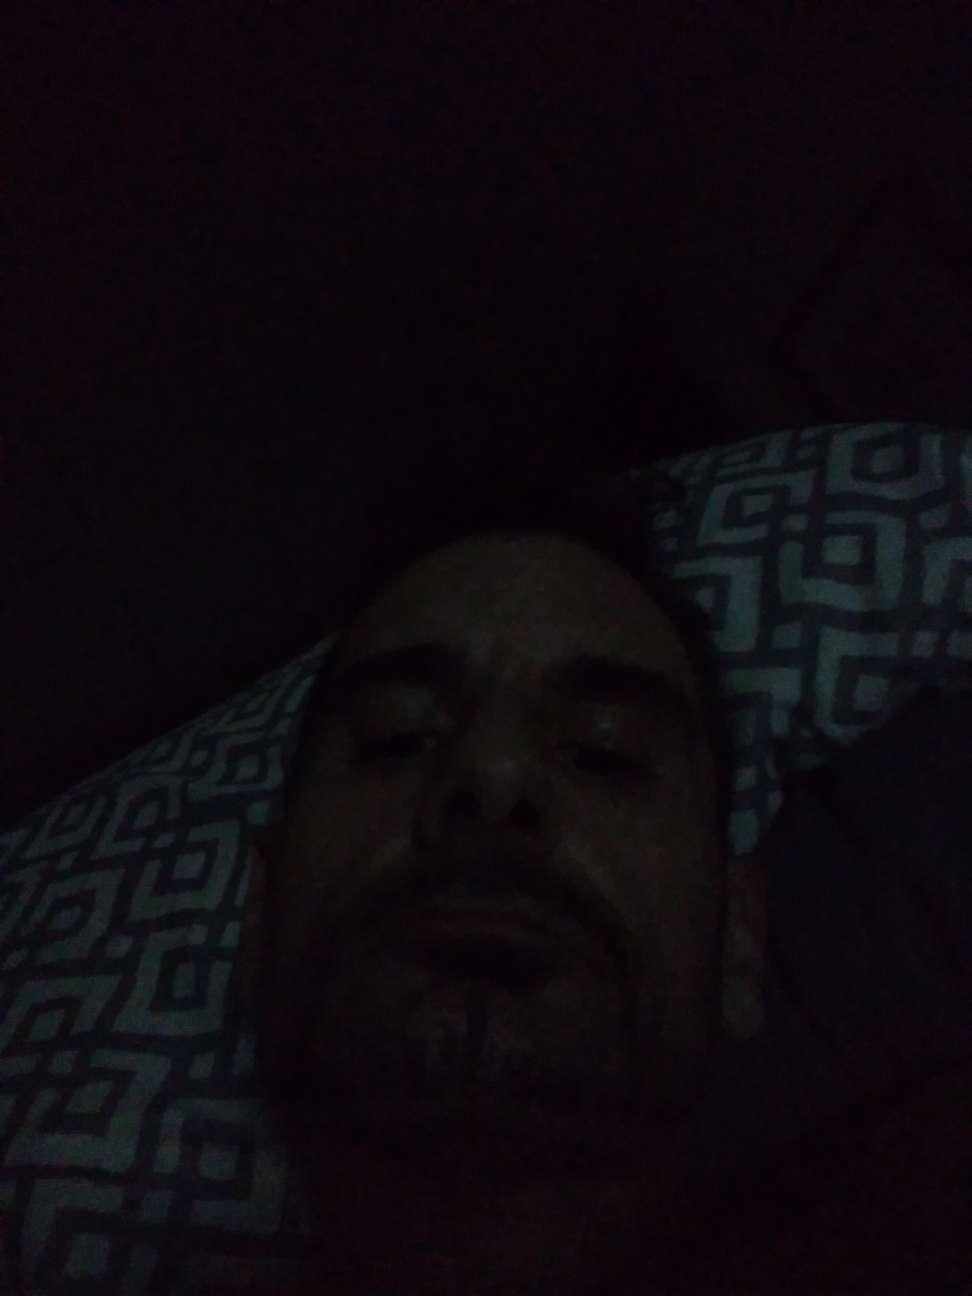 http://catch-app.oss-us-east-1.aliyuncs.com/image/d83942099b29e8b2fec6fc0ebfbecd64.jpeg